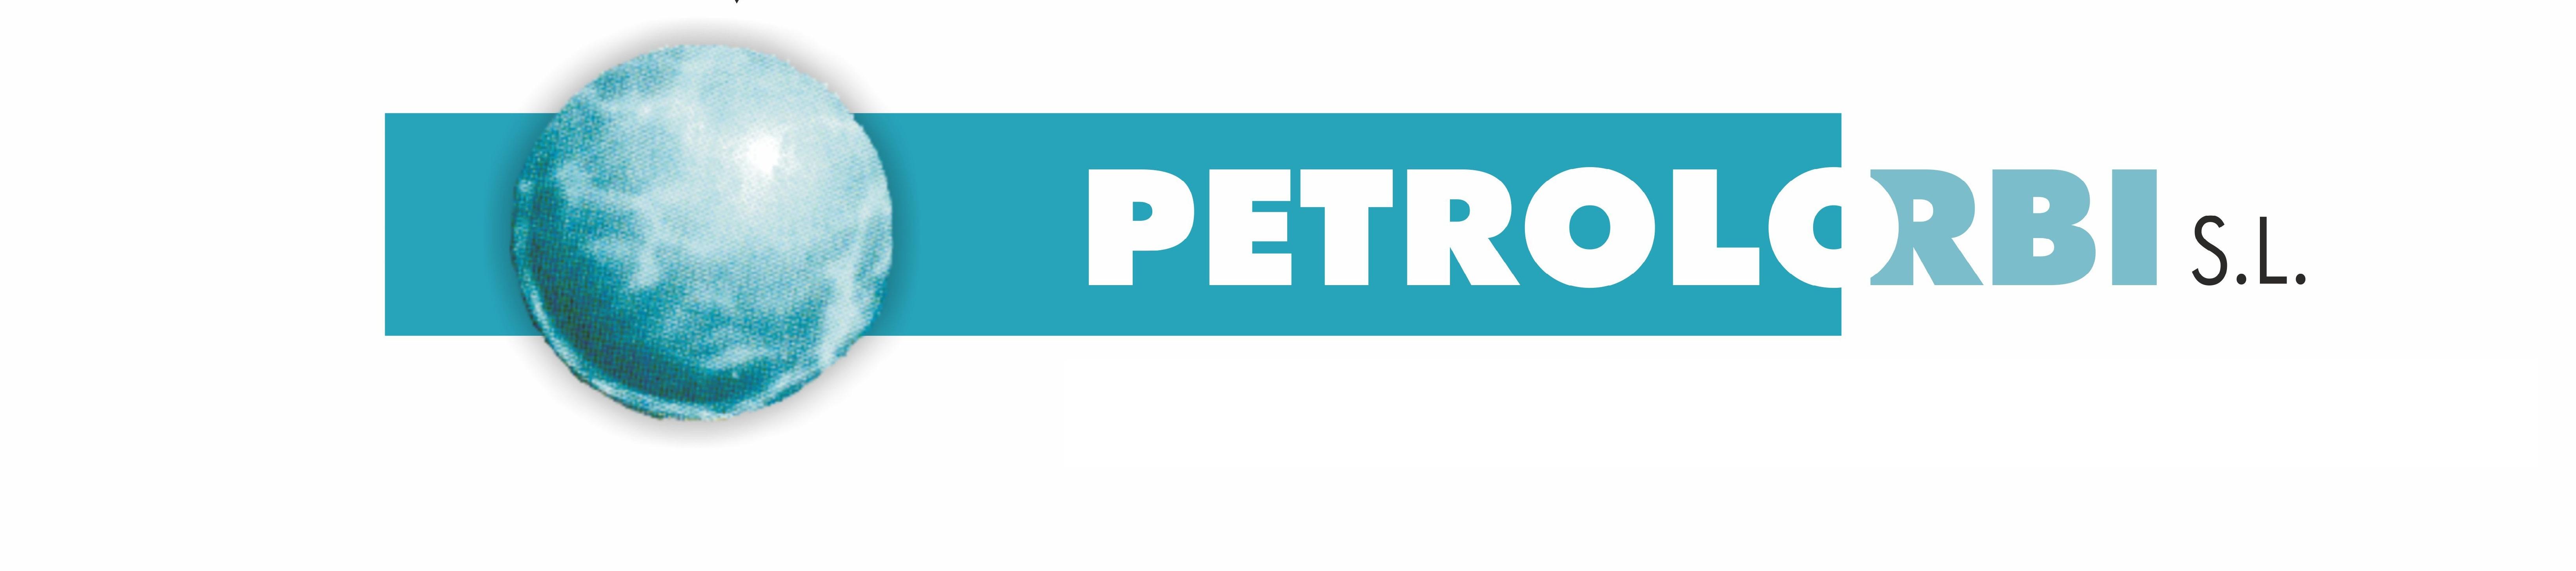 Petrolorbi, sl